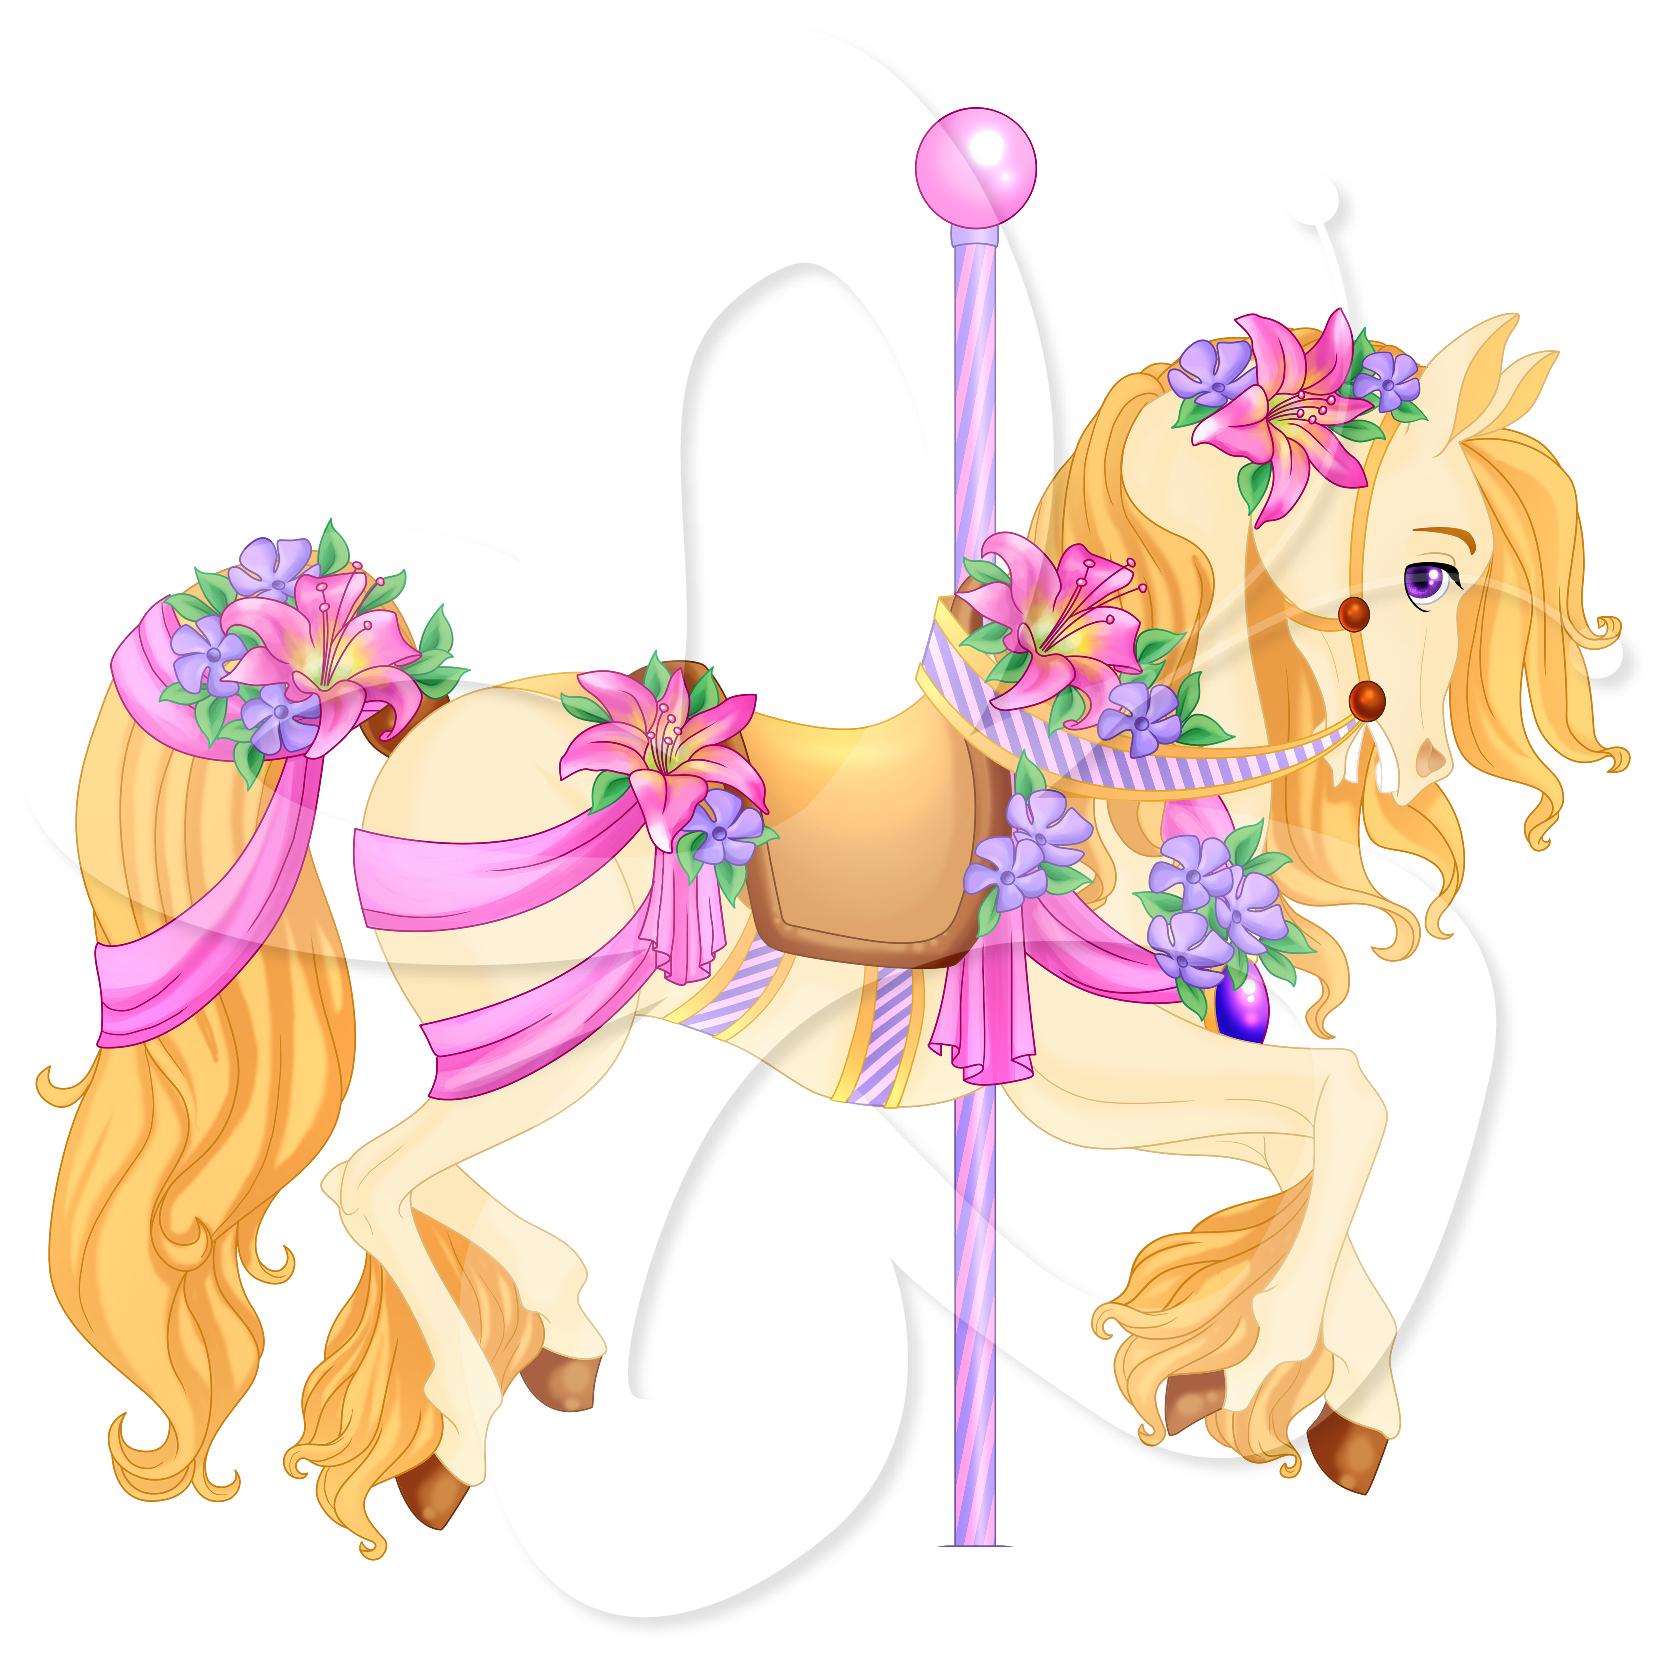 Carousel Horse Clipart & Carousel Horse Clip Art Images.